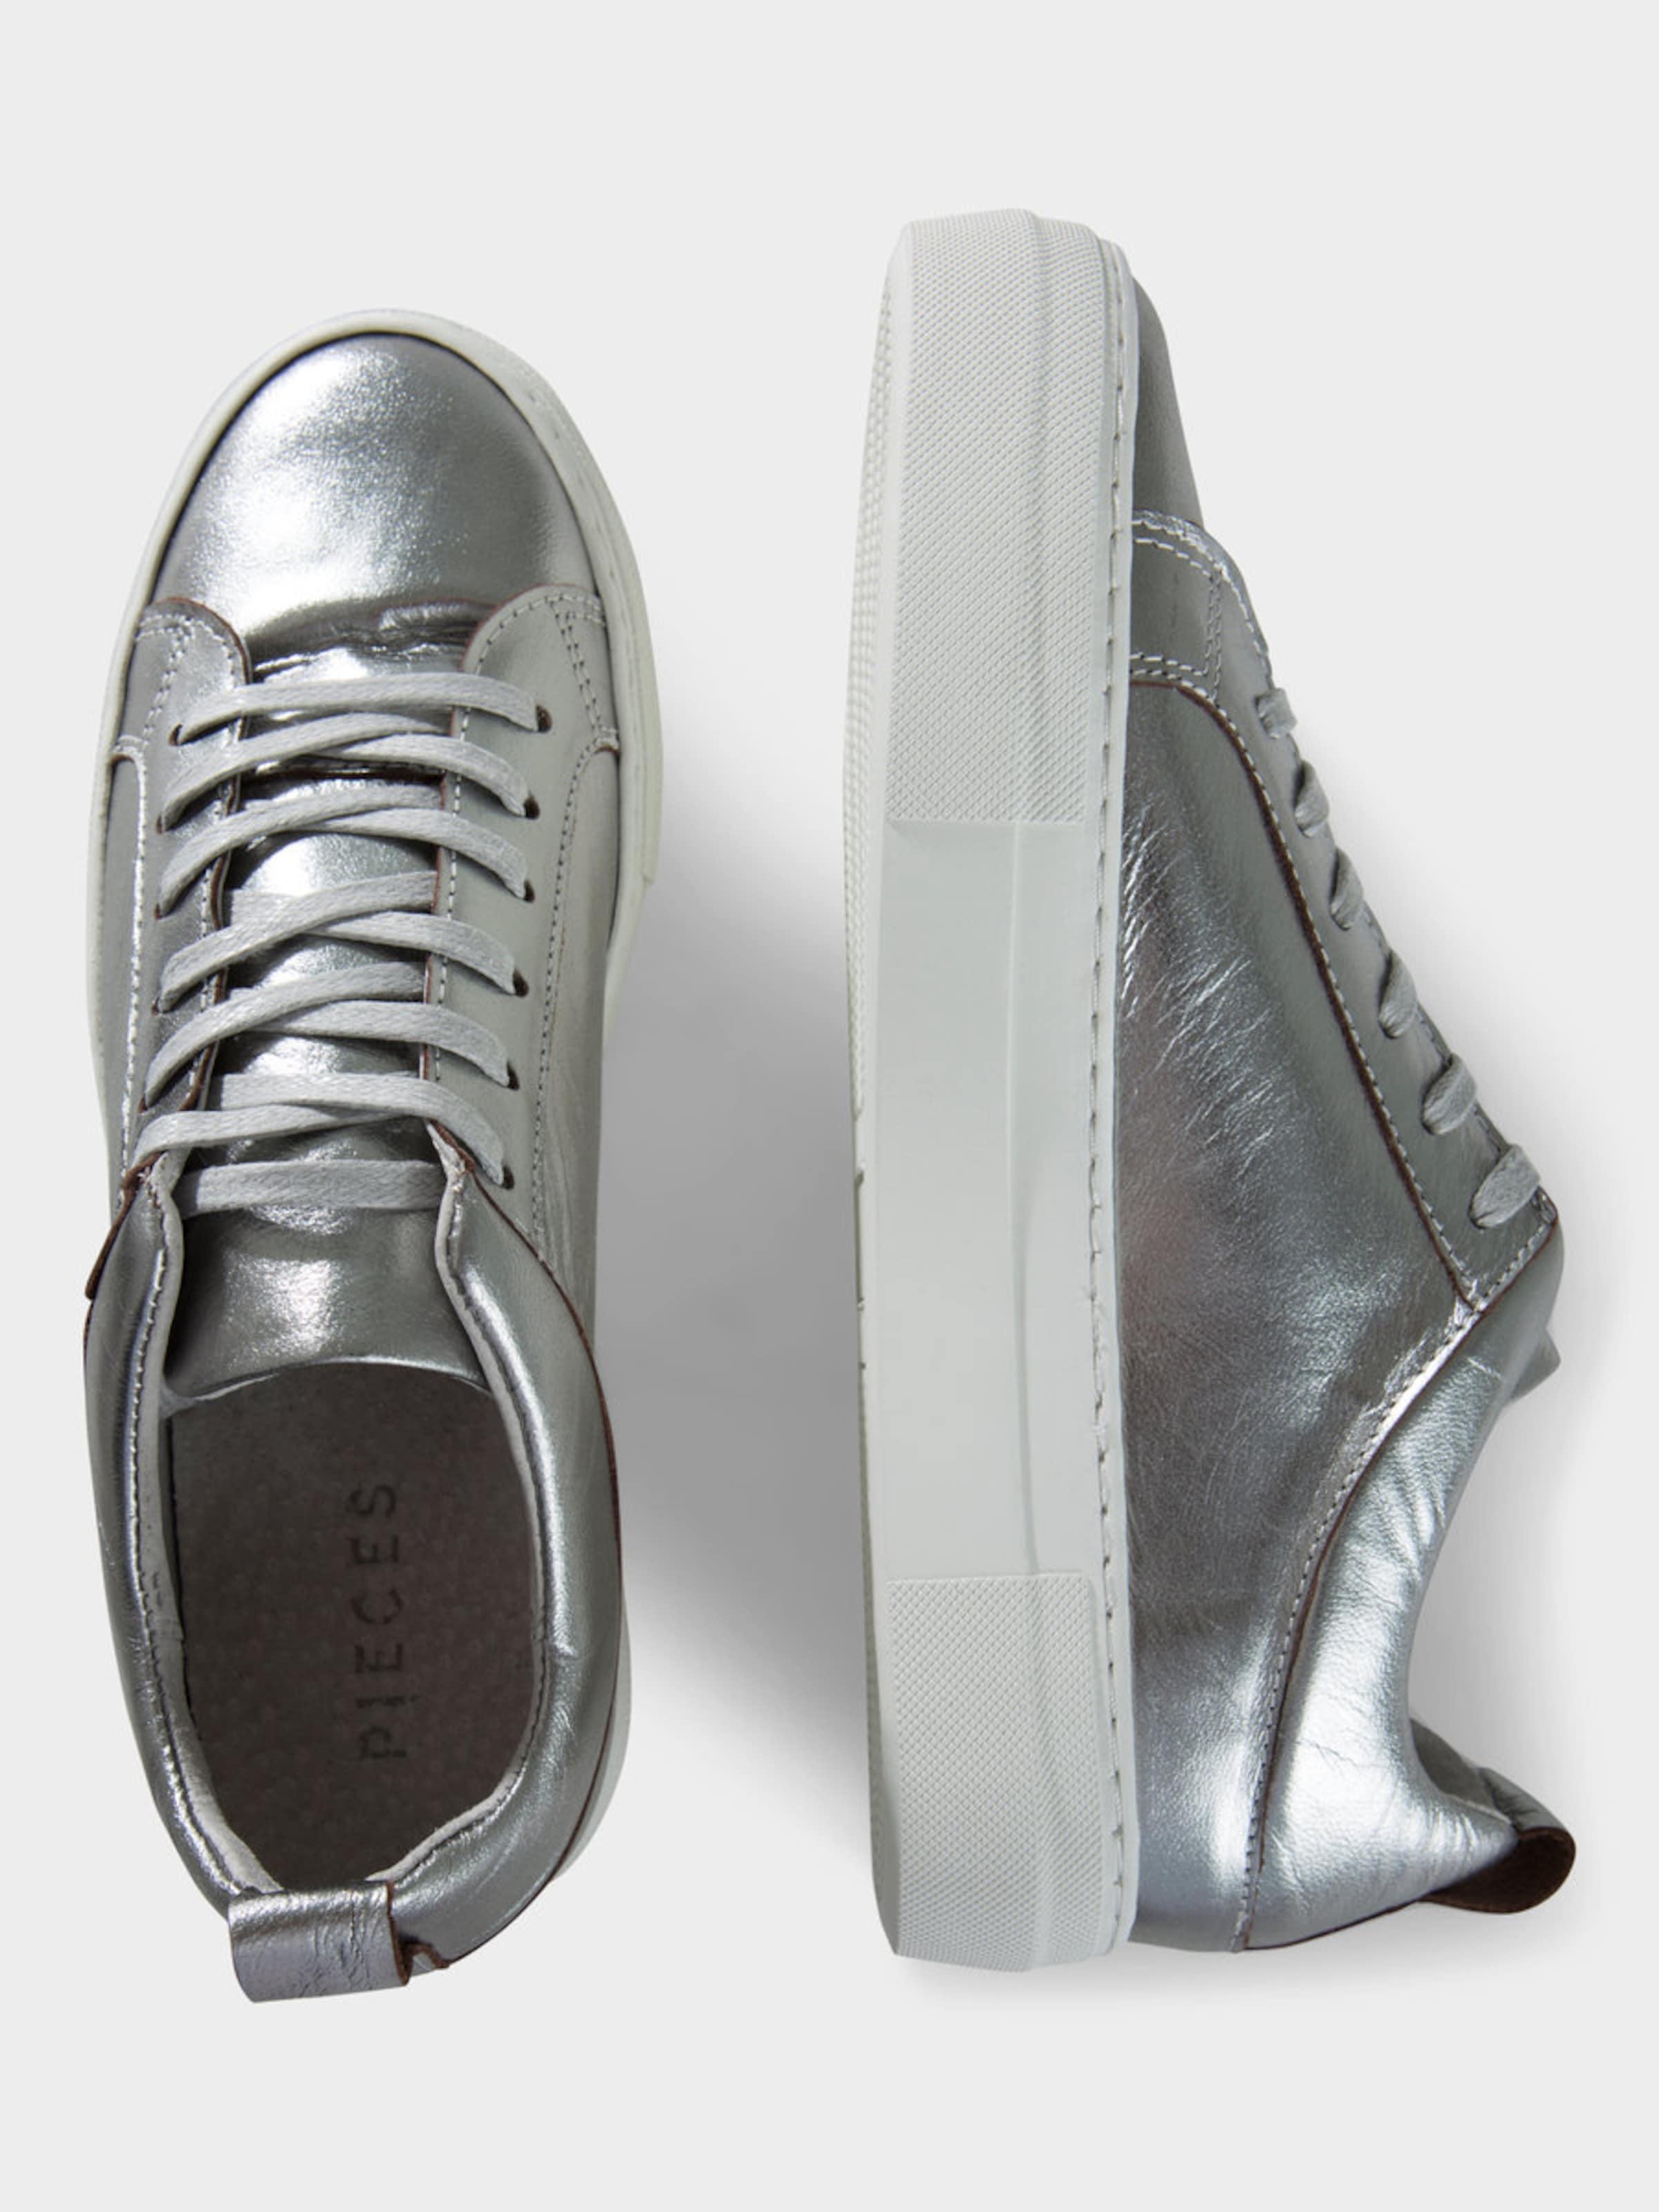 PIECES PIECES Sneaker PIECES PIECES Sneaker PIECES PIECES Sneaker PIECES Sneaker Sneaker Sneaker PIECES Sneaker wCqIct